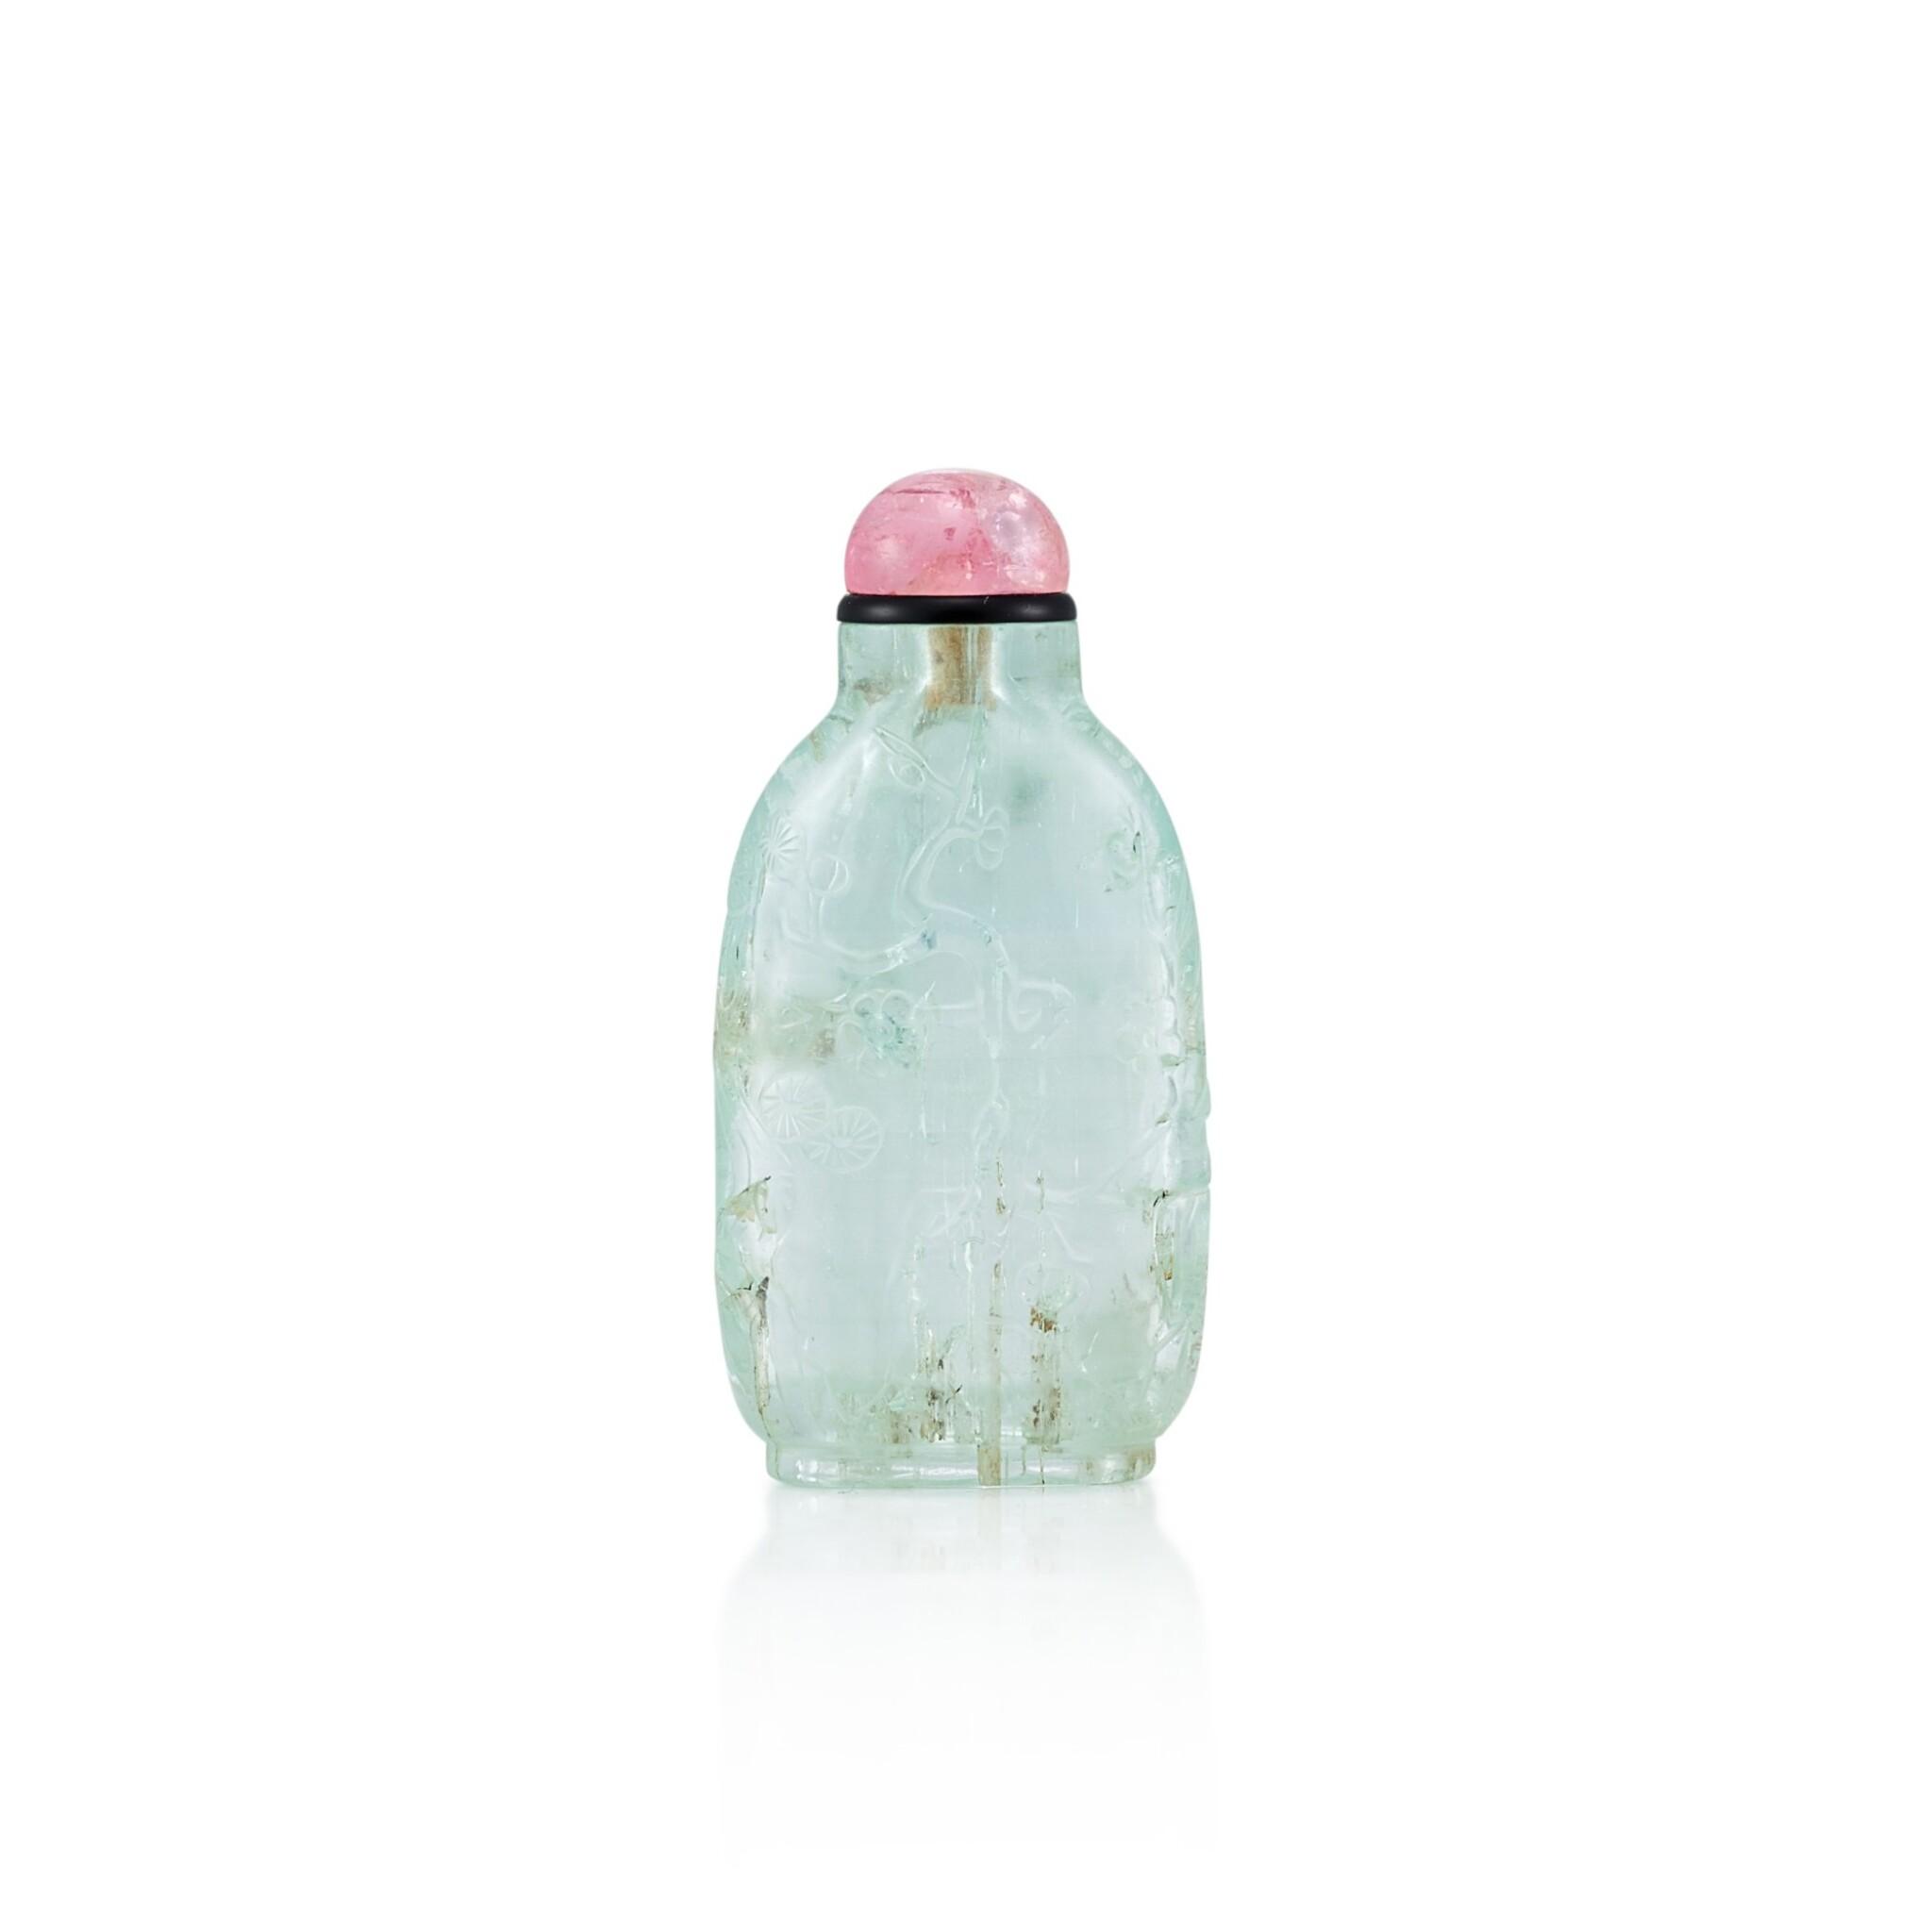 View full screen - View 1 of Lot 3021. An Aquamarine 'Three Friends of Winter' Snuff Bottle Qing Dynasty, 18th - 19th Century | 清十八至十九世紀 海藍寶雕歲寒三友圖鼻煙壺.